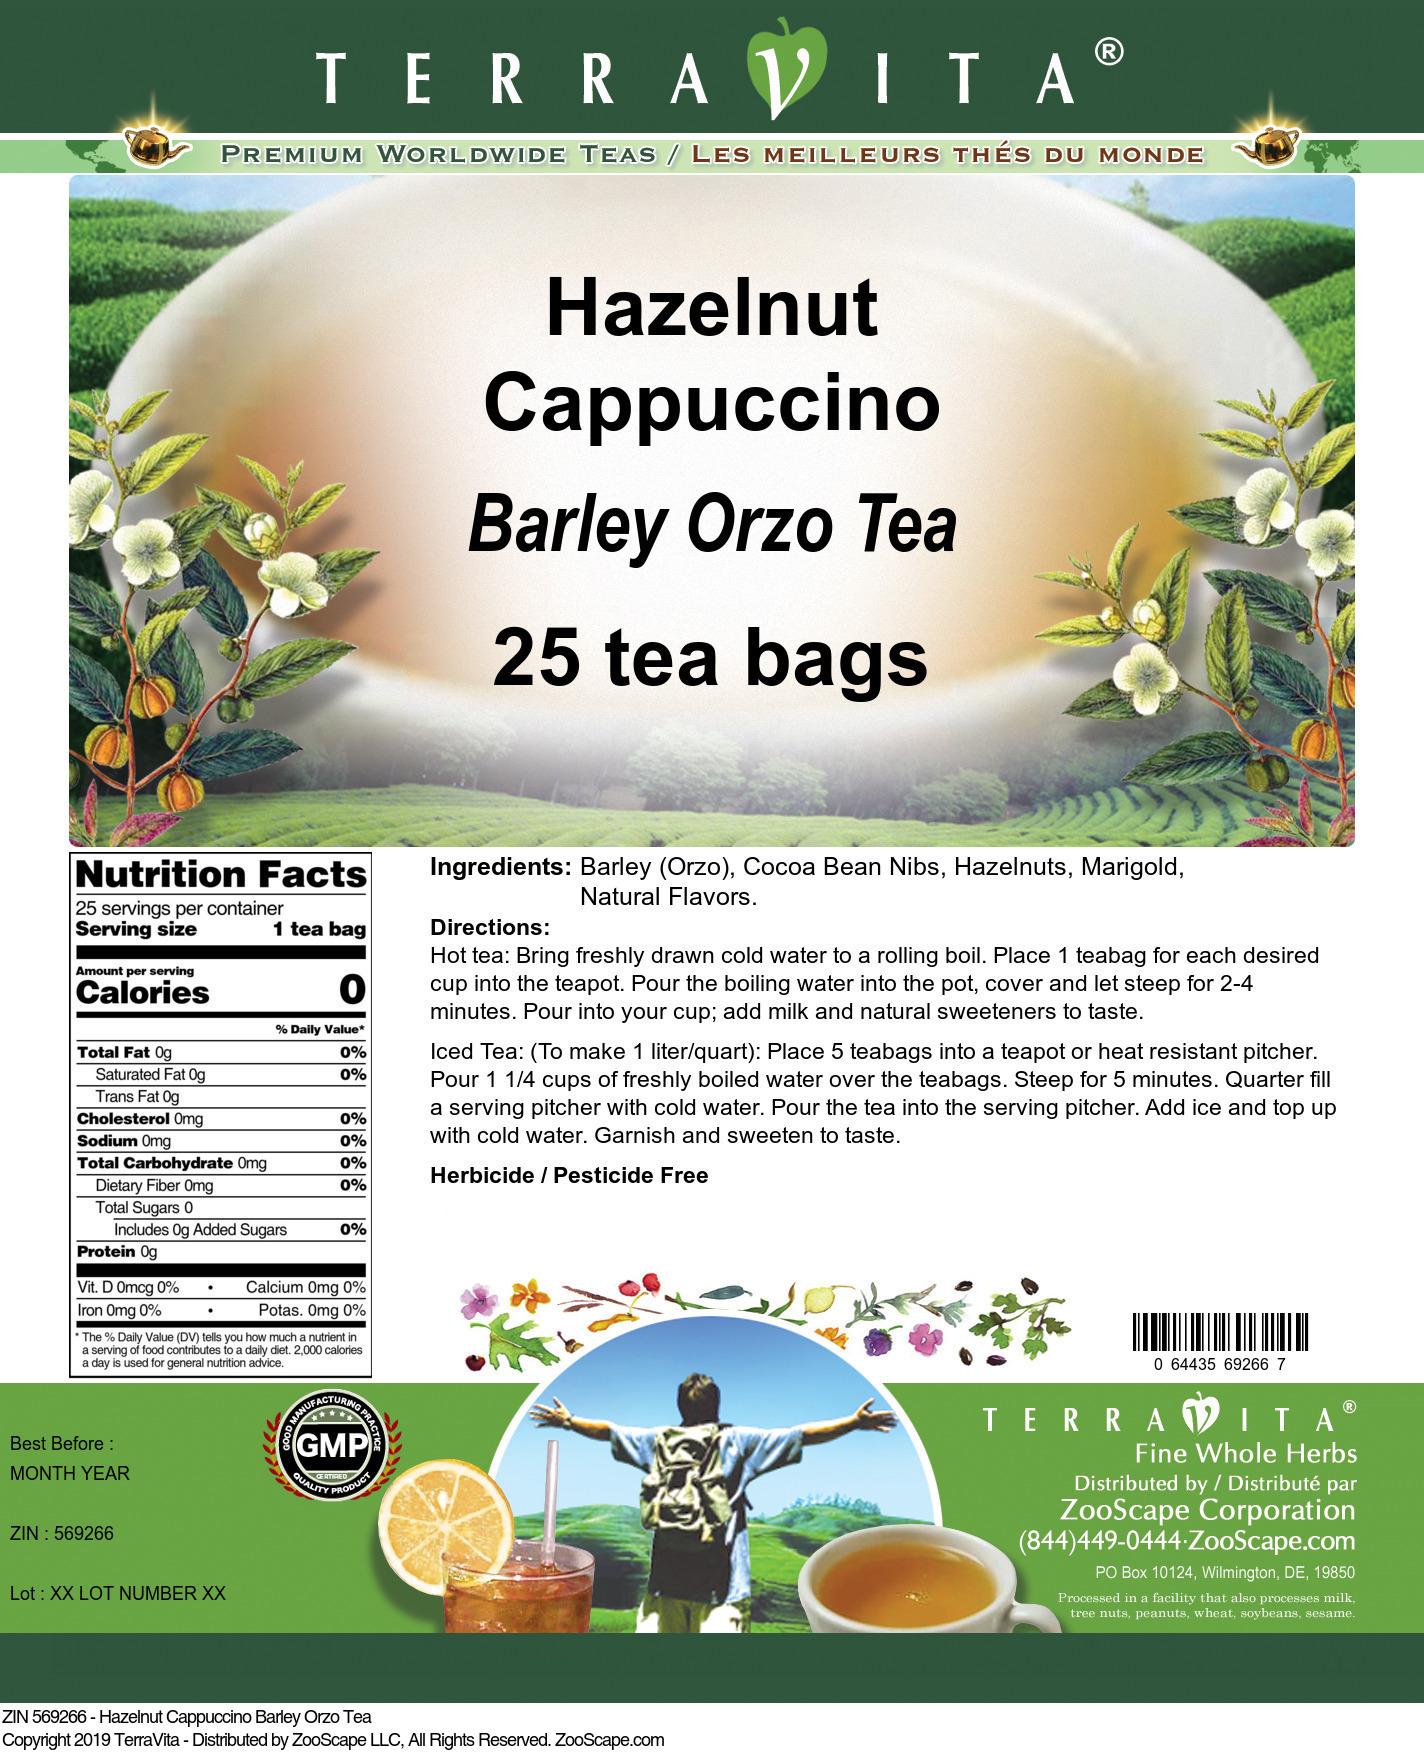 Hazelnut Cappuccino Barley Orzo